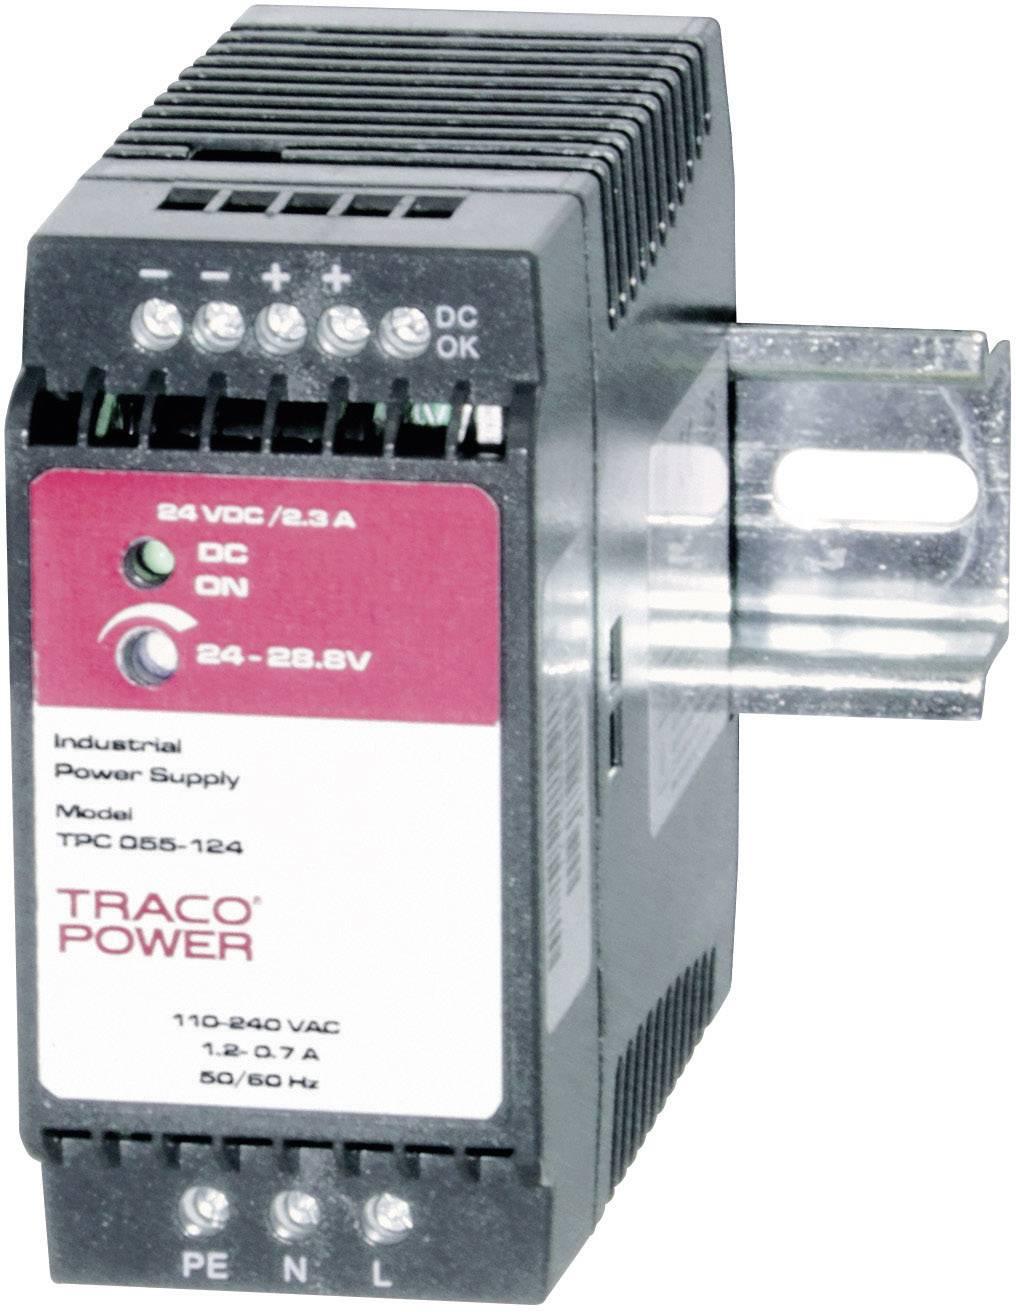 Zdroj na DIN lištu TracoPower TPC 055-124, 24 - 28,8 V/DC, 2,3 A